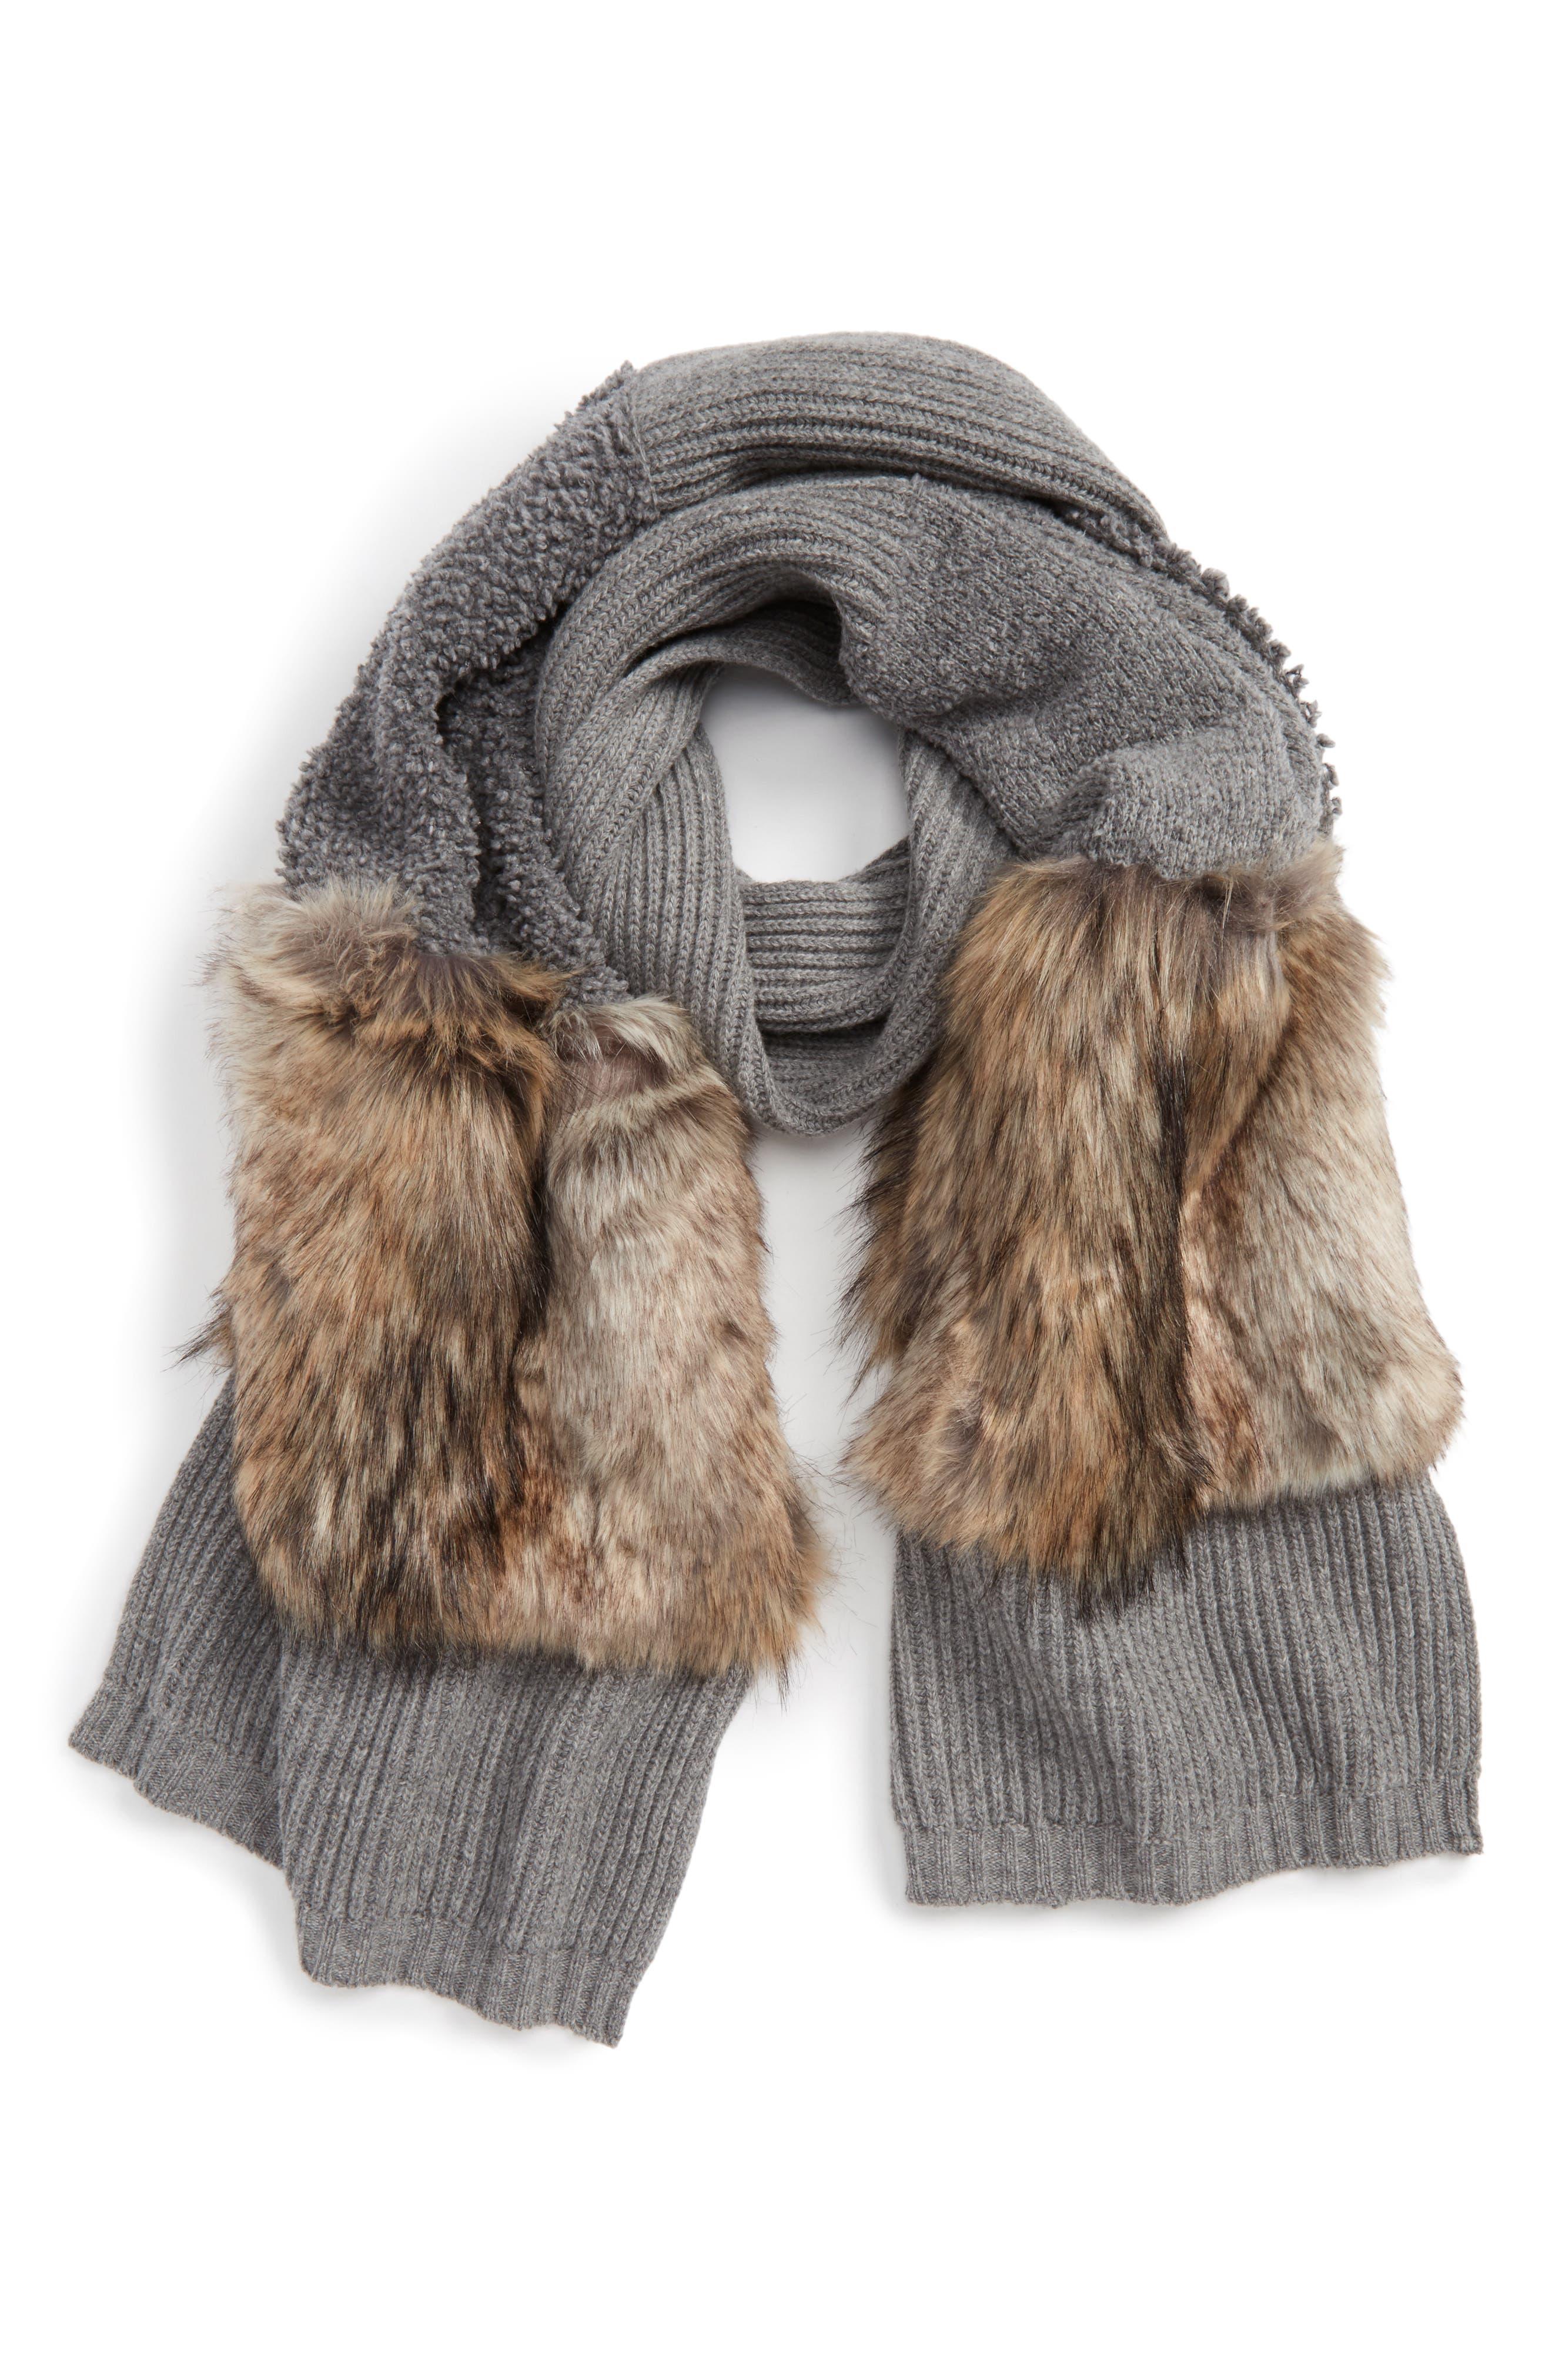 Main Image - Stella McCartney Wool Scarf with Faux Fur Panels